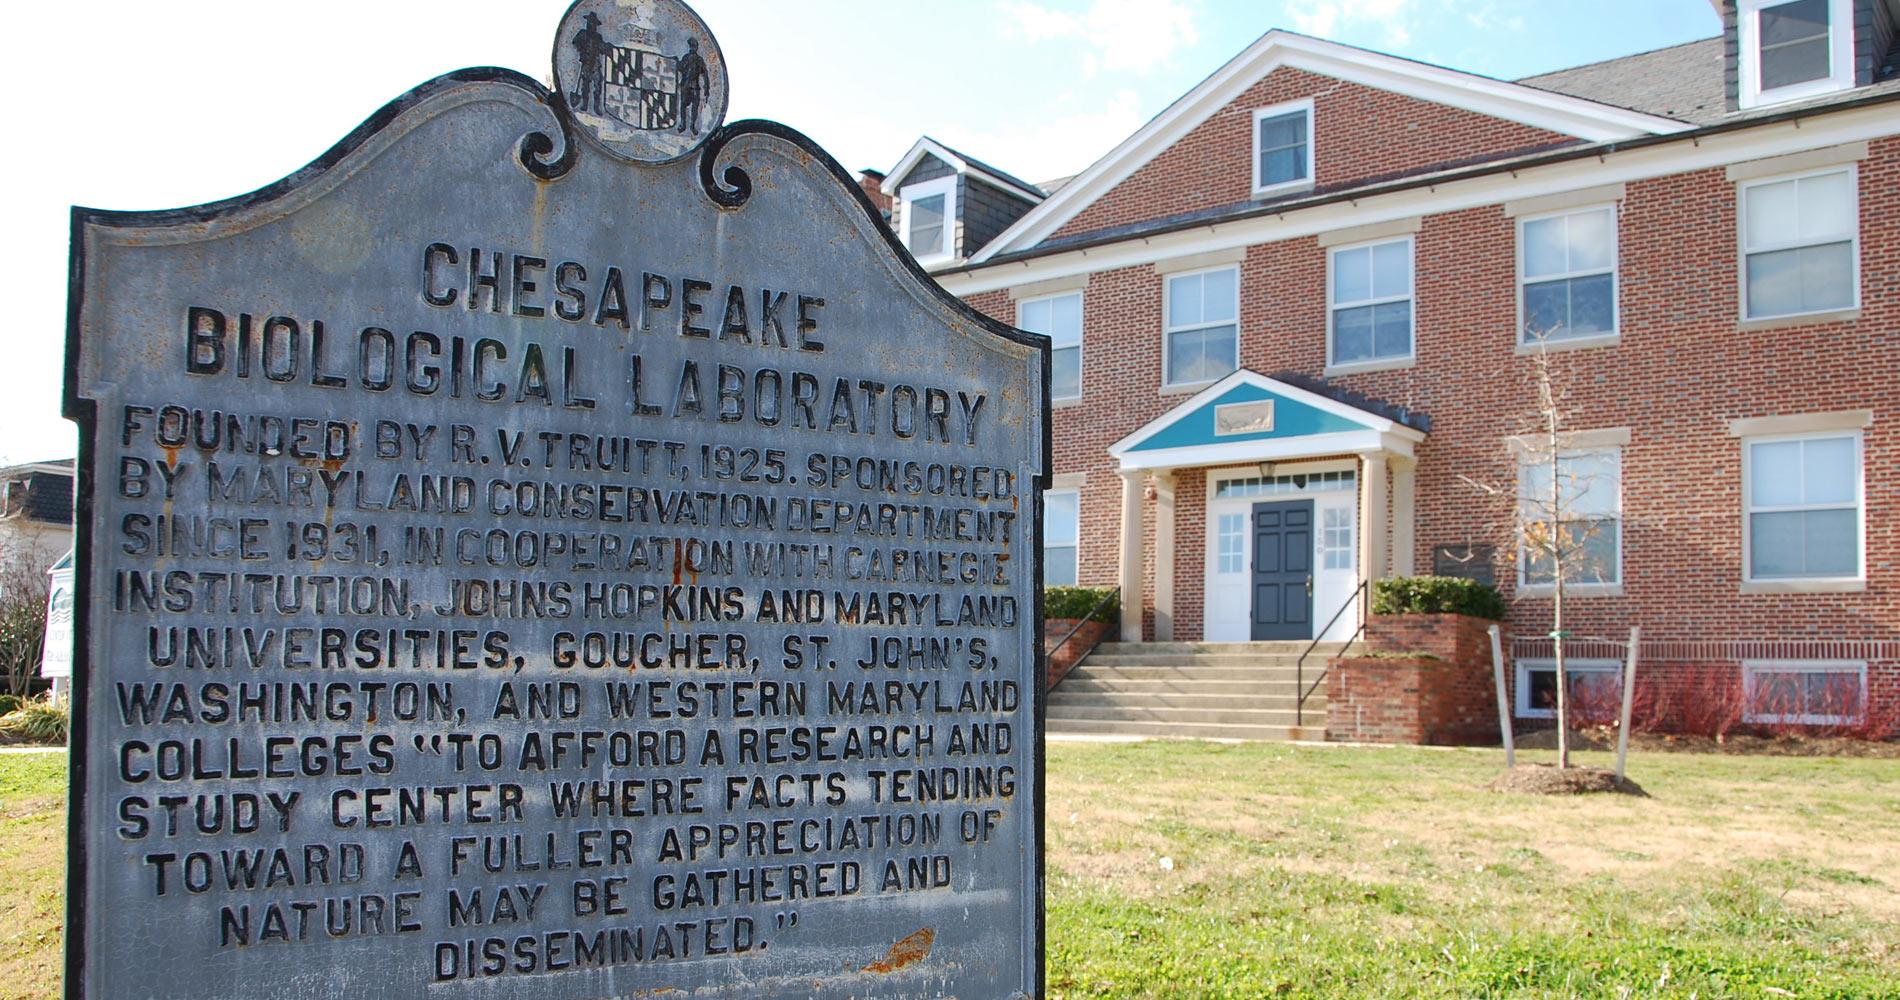 Chesapeake Biological Laboratory (UMCES)